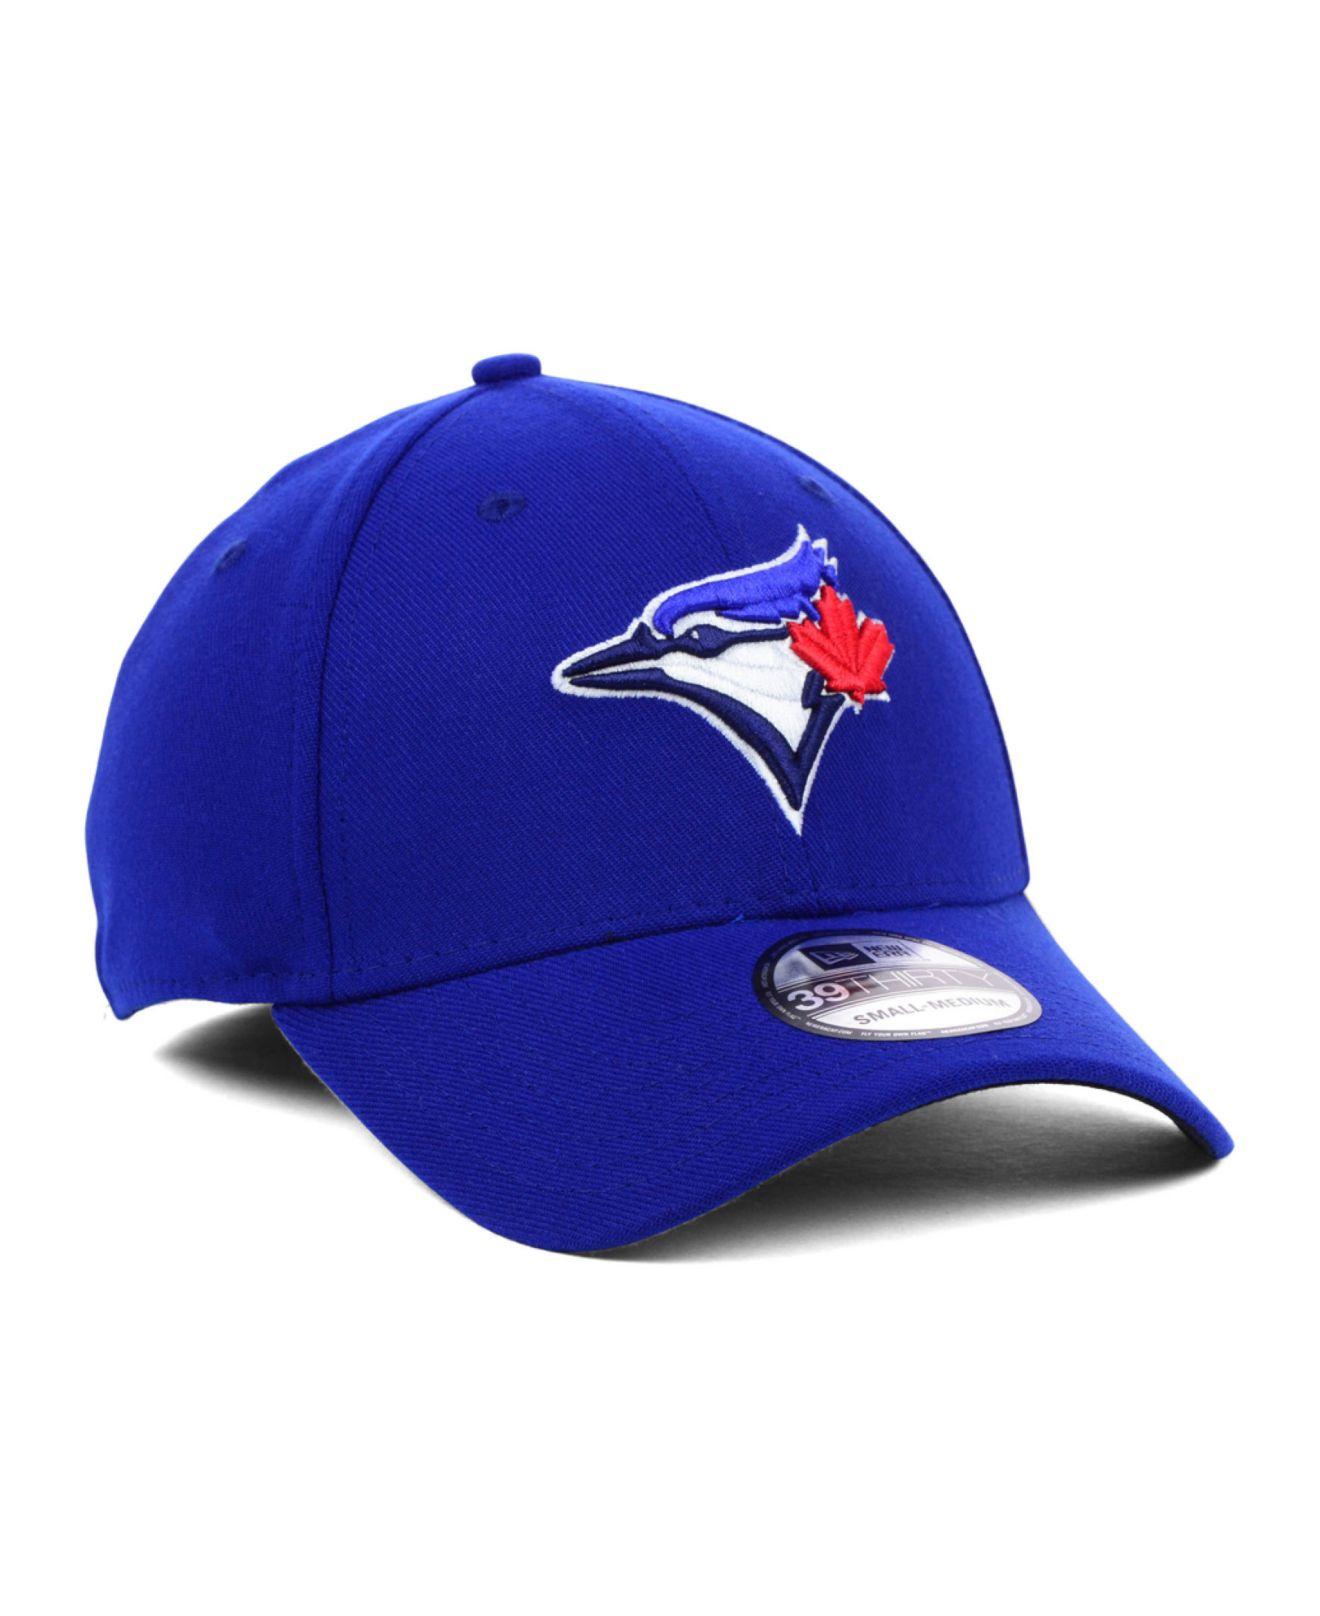 online retailer 7951f 802f3 KTZ Toronto Blue Jays Mlb Team Classic 39thirty Cap in Blue for Men - Lyst